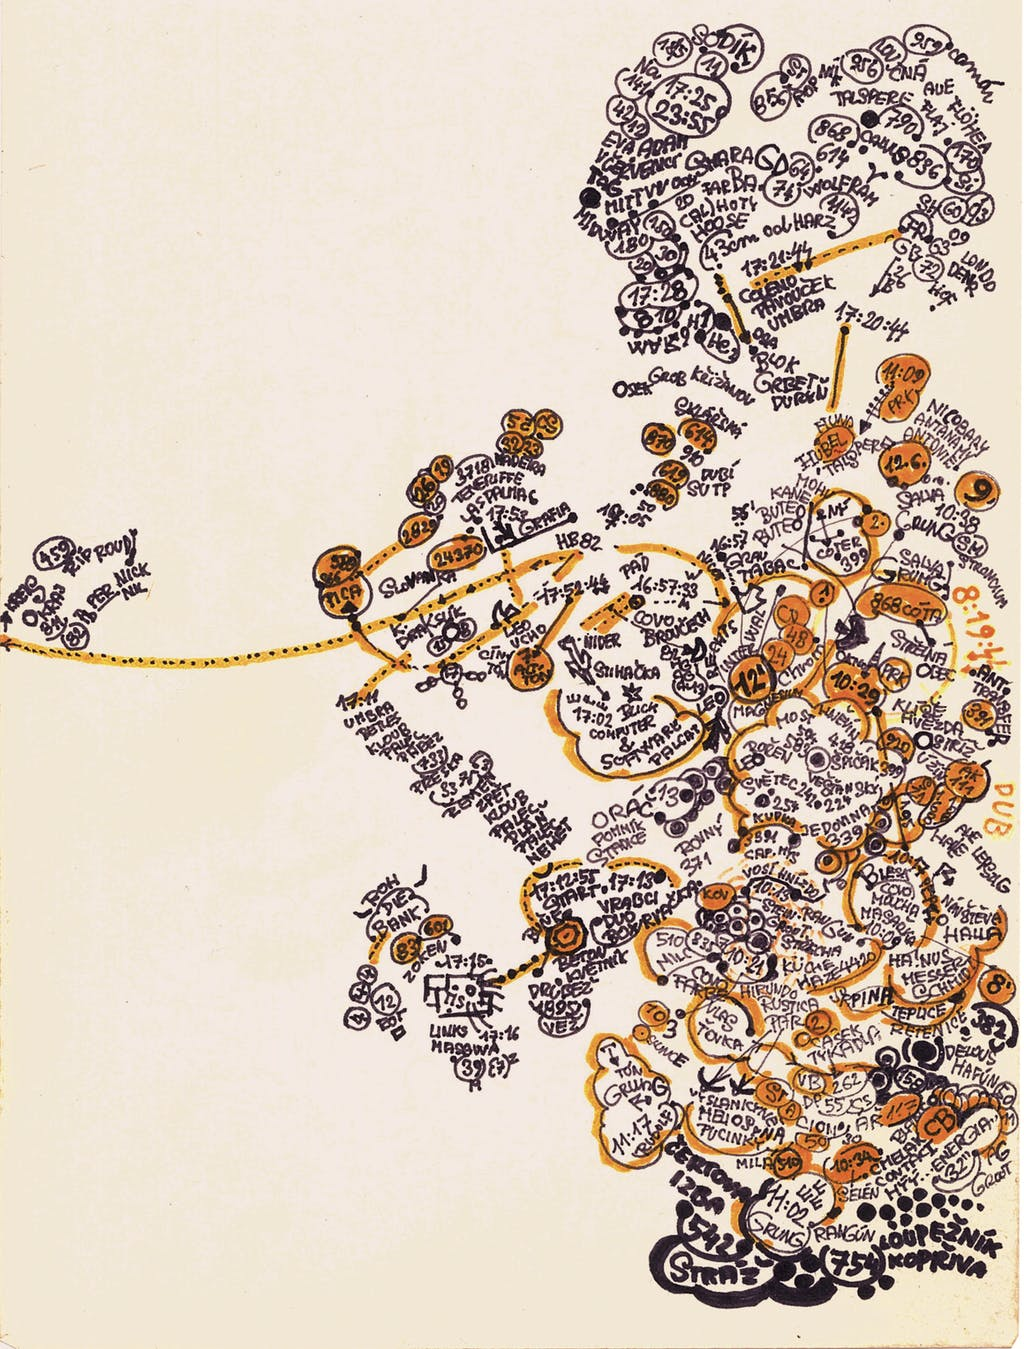 Zdenek Kosek, *untitled*, circa 1985. ink and marker on paper, 7.6 x 5.79 in - © christian berst art brut, christian berst — art brut